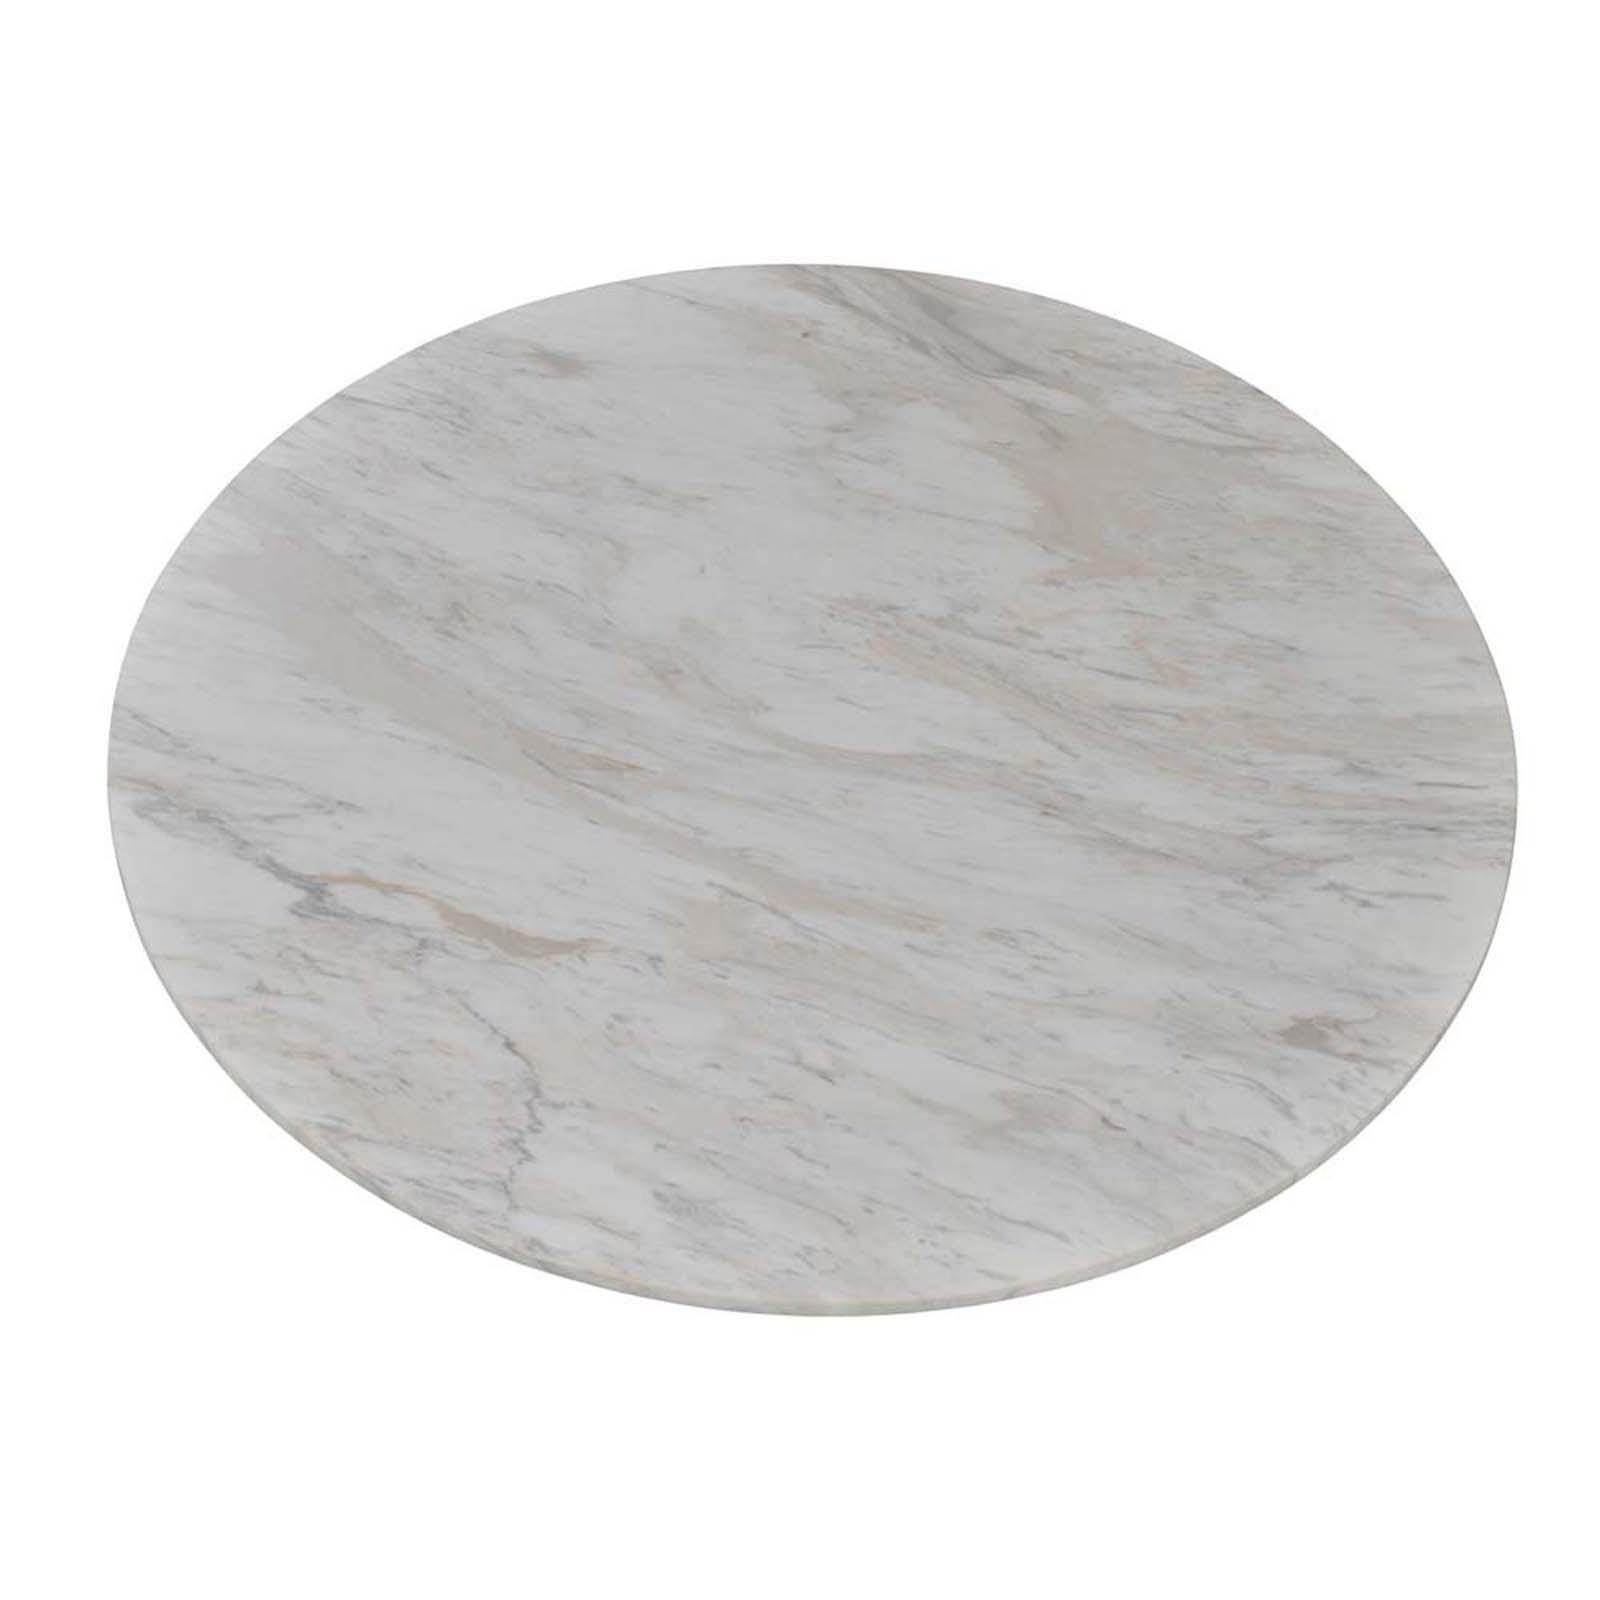 "21.5"" White Carrara Italian Marble Round Table Top"